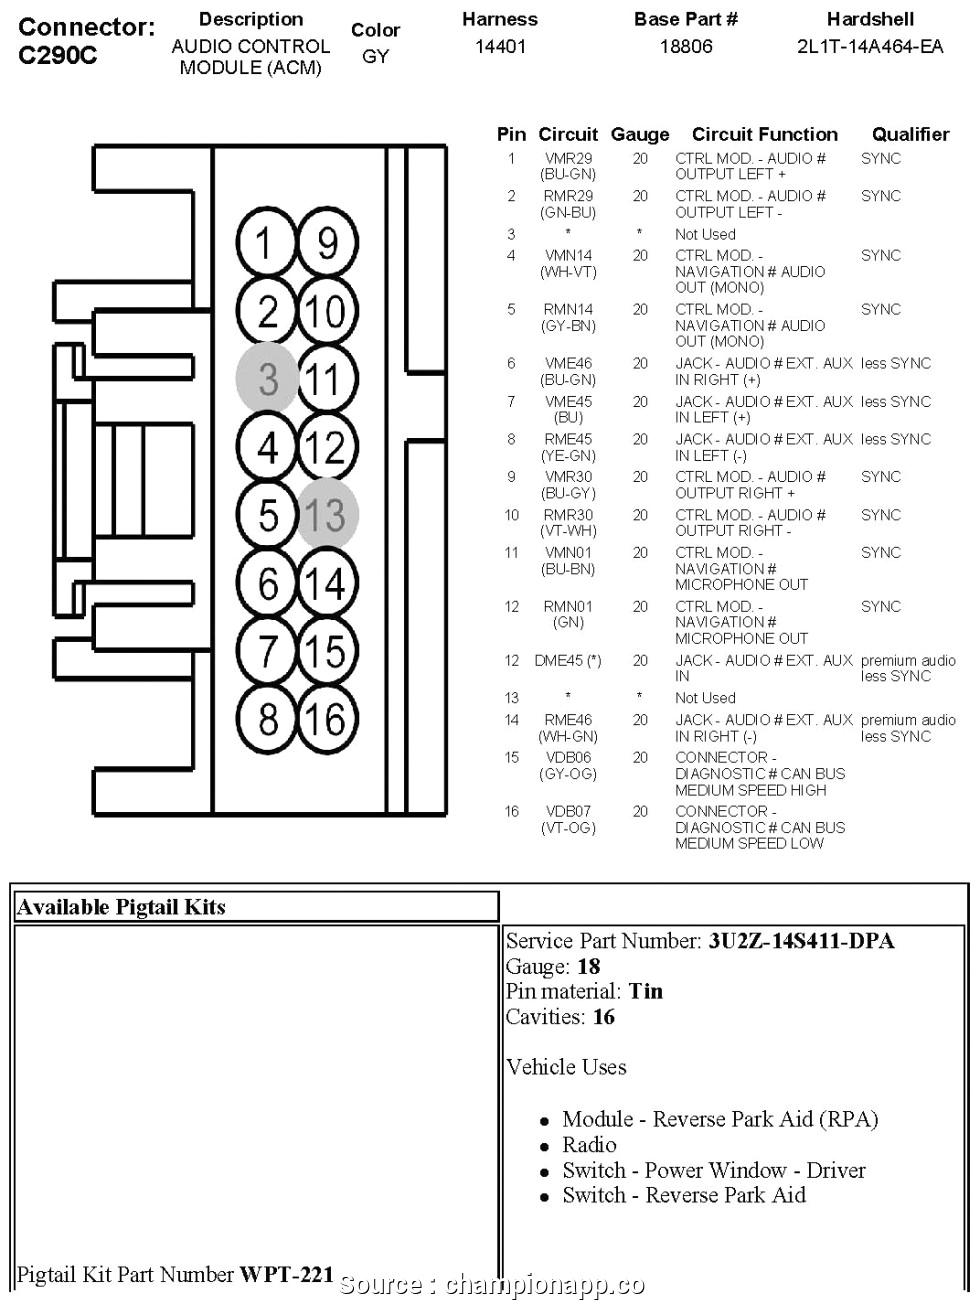 briliant kenwood kdc 216s wiring diagram kenwood kdc wiring harness rh workplacelearning info